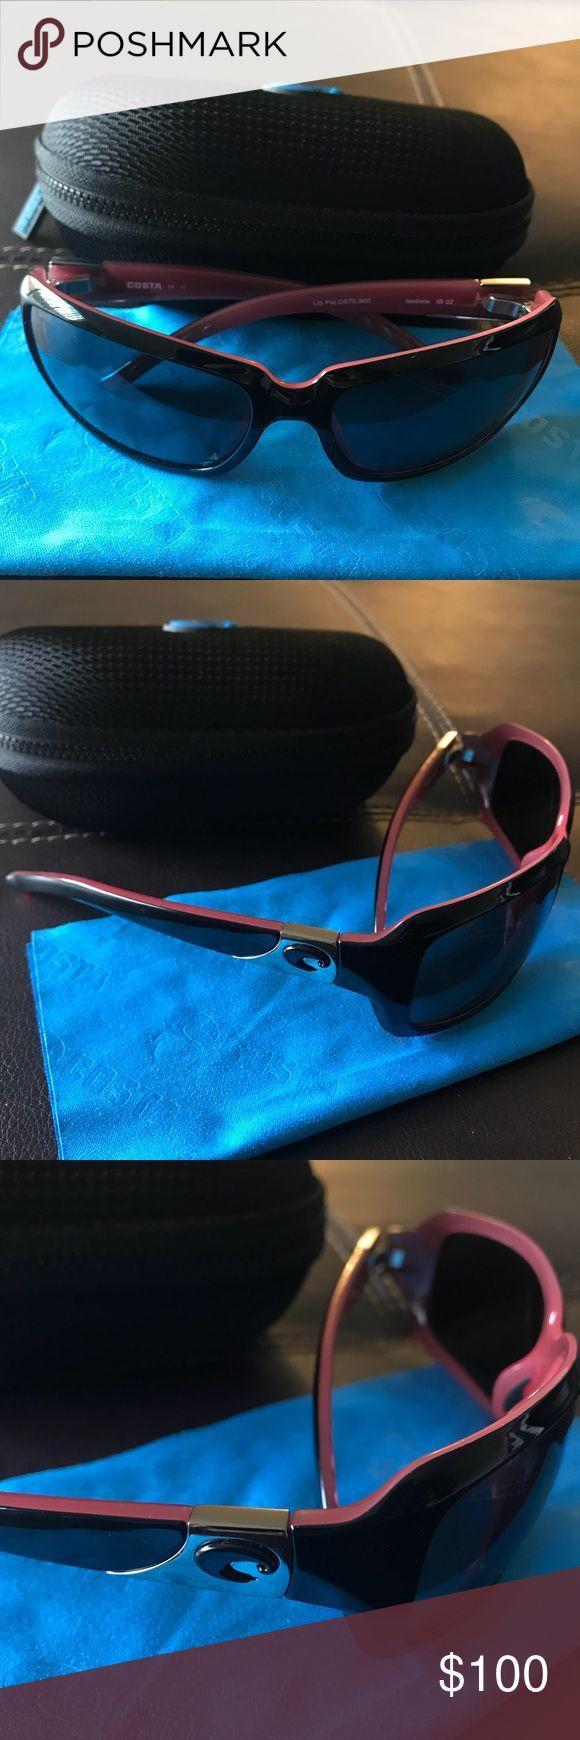 Costa Del Mar Sunglasses Isabella 580P Black/Coral Frame Grey Lenses Costa Del Mar Accessories Sunglasses